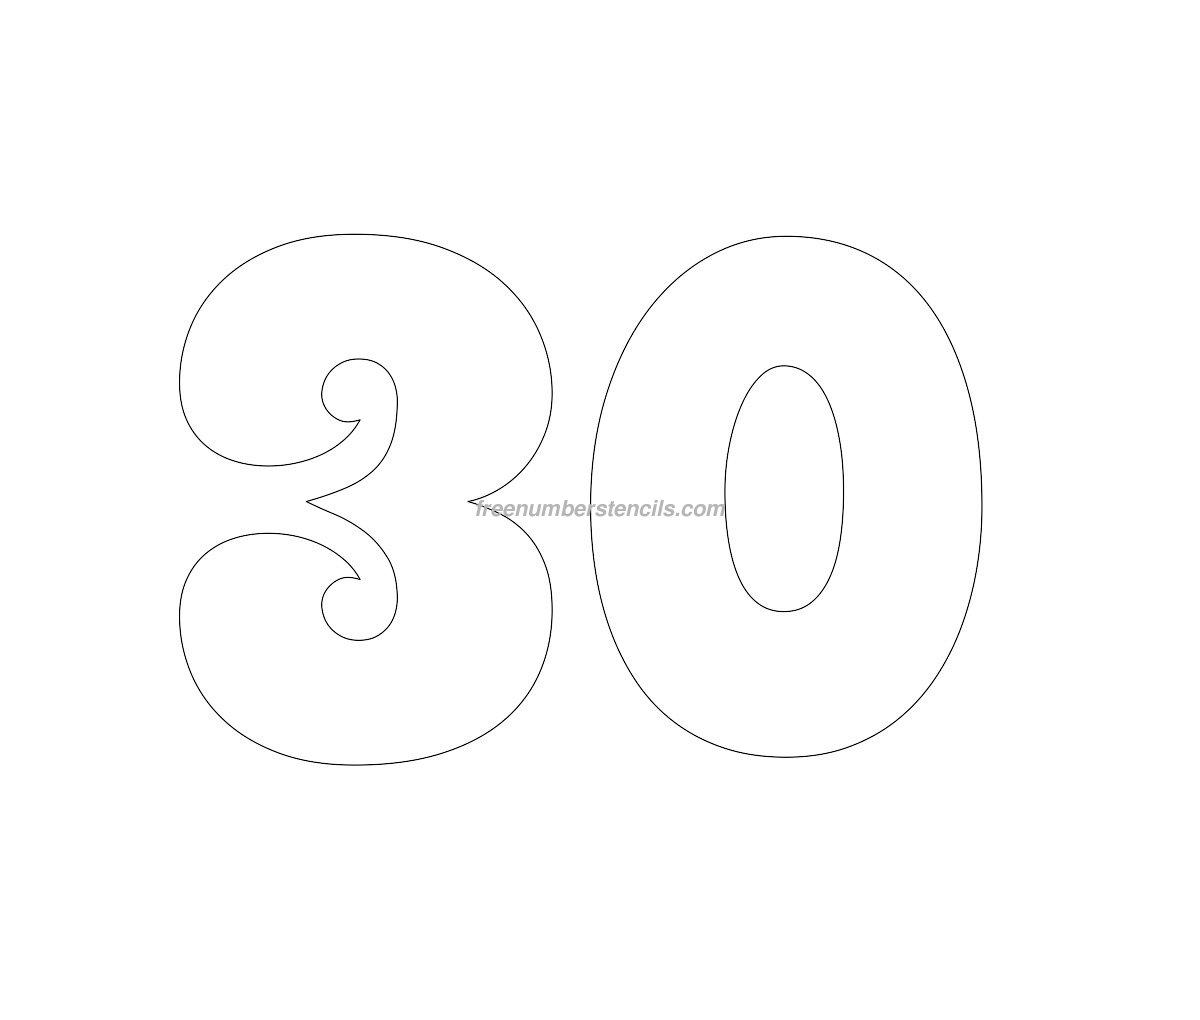 Free Groovy 79 Number Stencil Freenumberstencils – Number Template